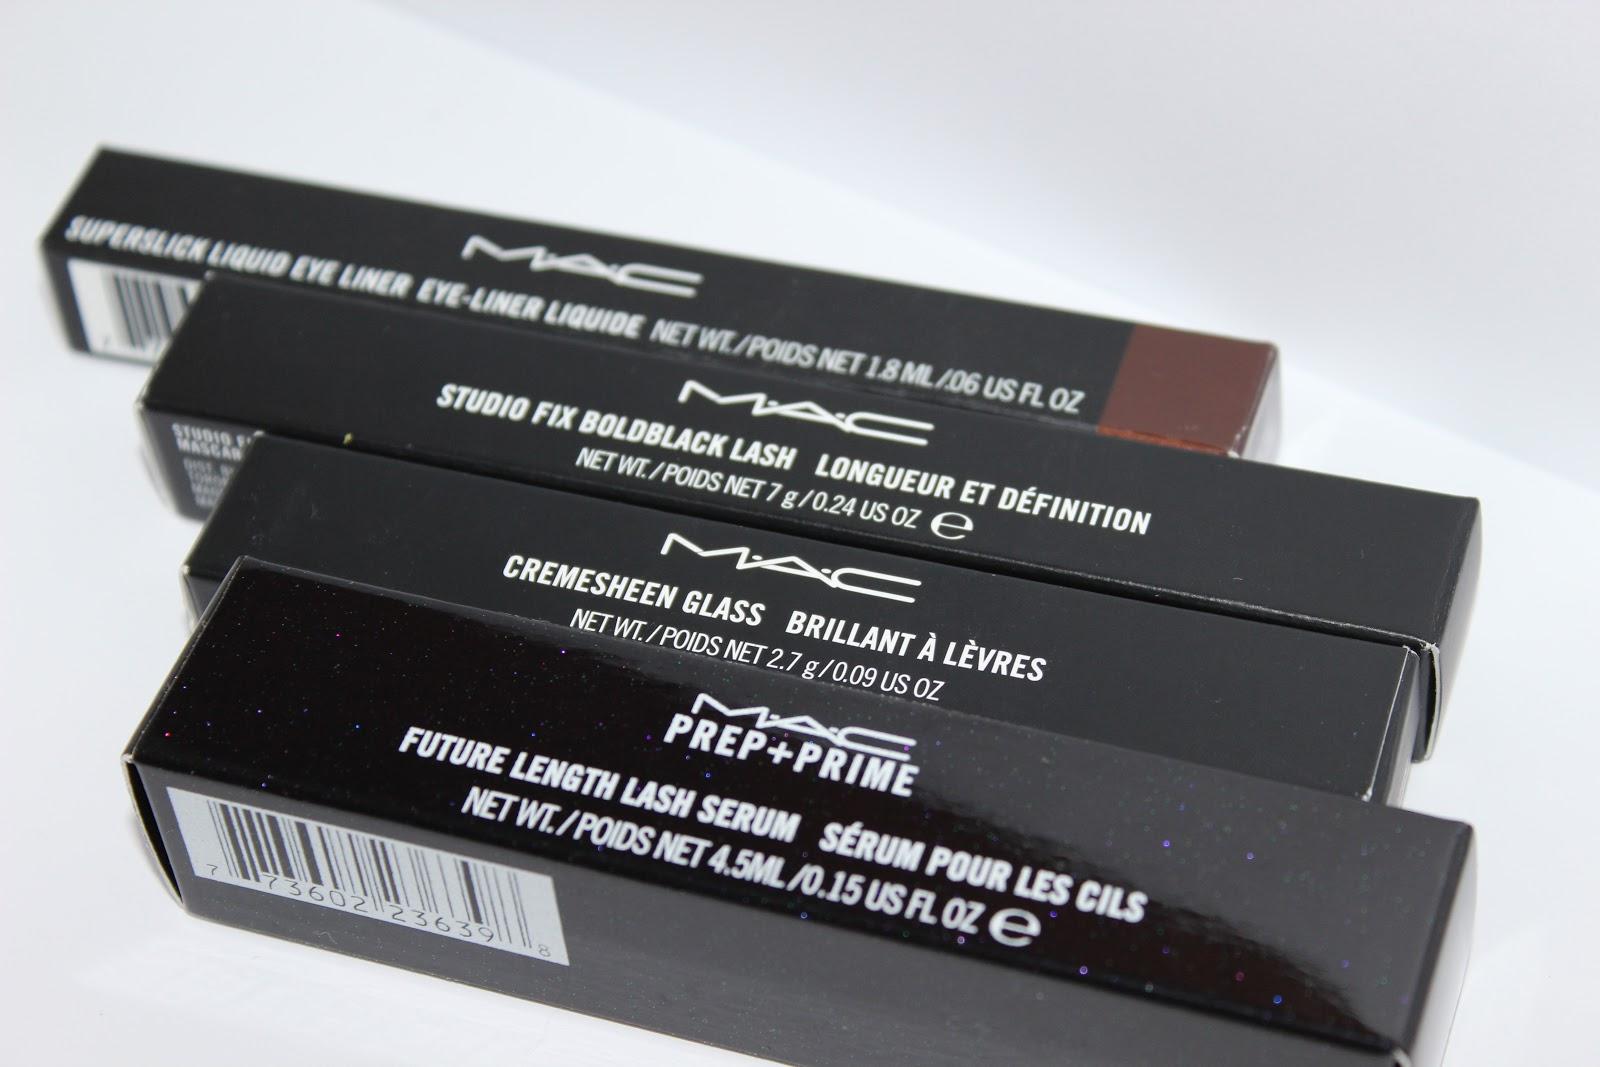 79247061d46 MAC Prep+Primer - Future Length Lash Serum. How to enter: